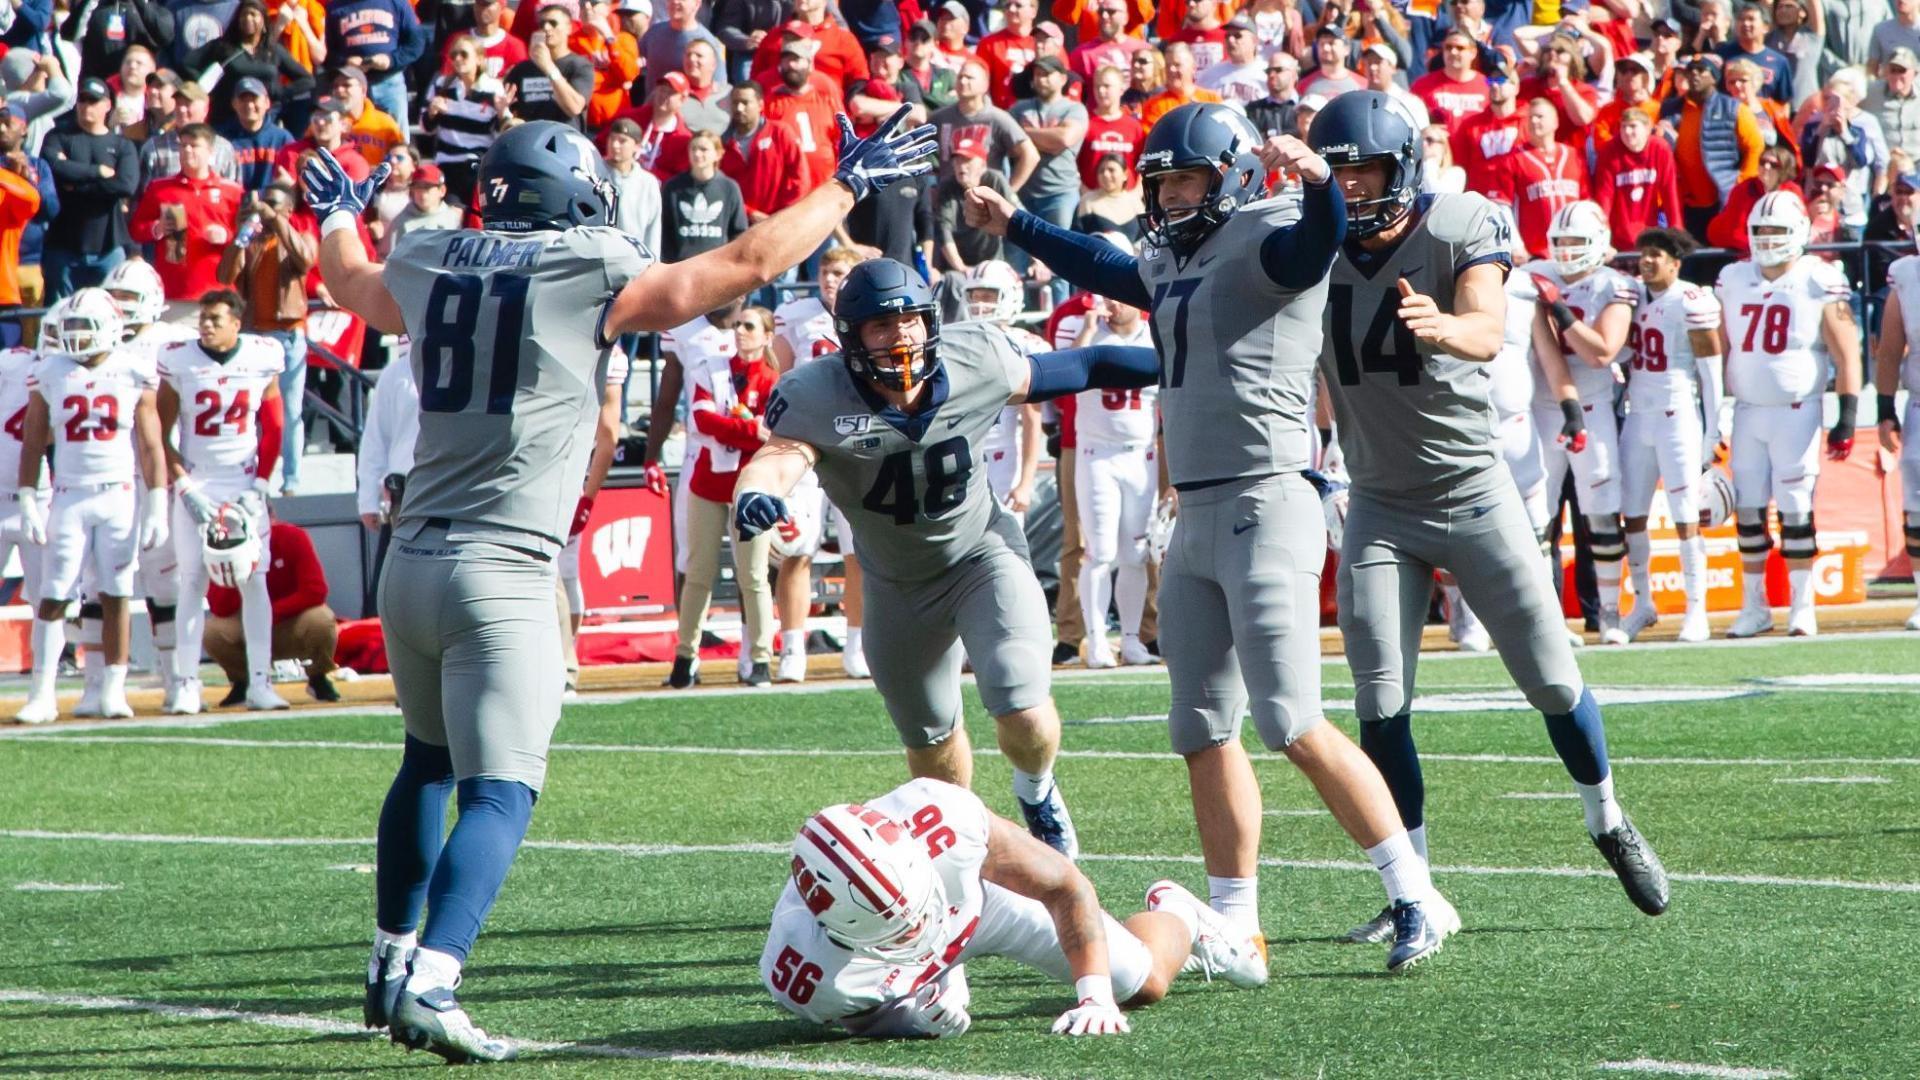 Illinois upsets Wisconsin with 39-yard FG